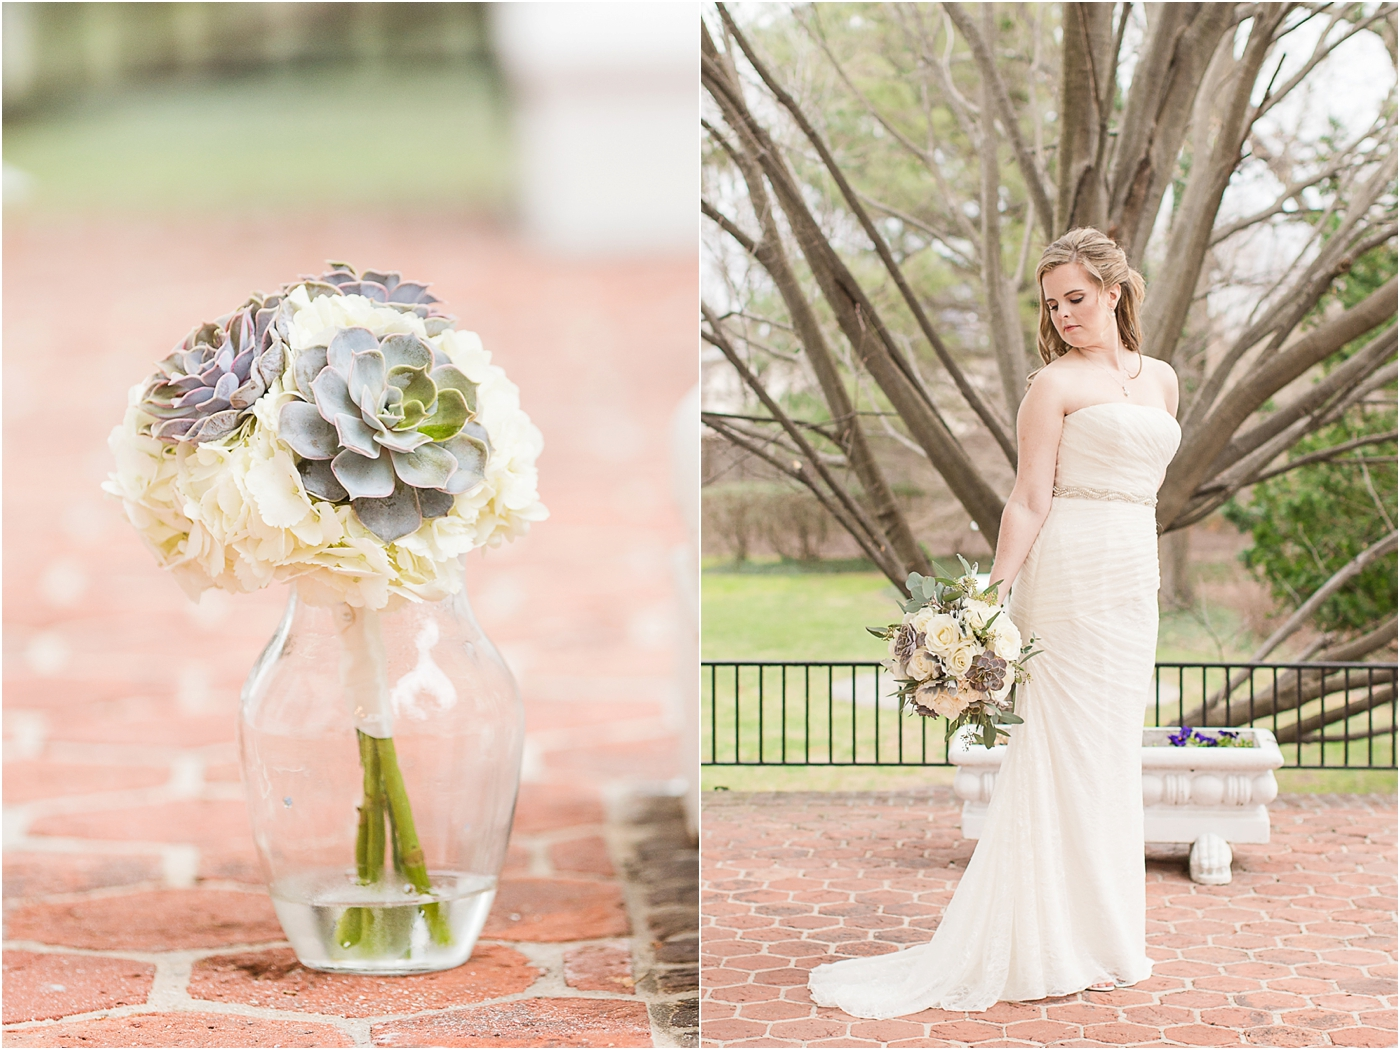 Greyrock-mansion-wedding-29.jpg